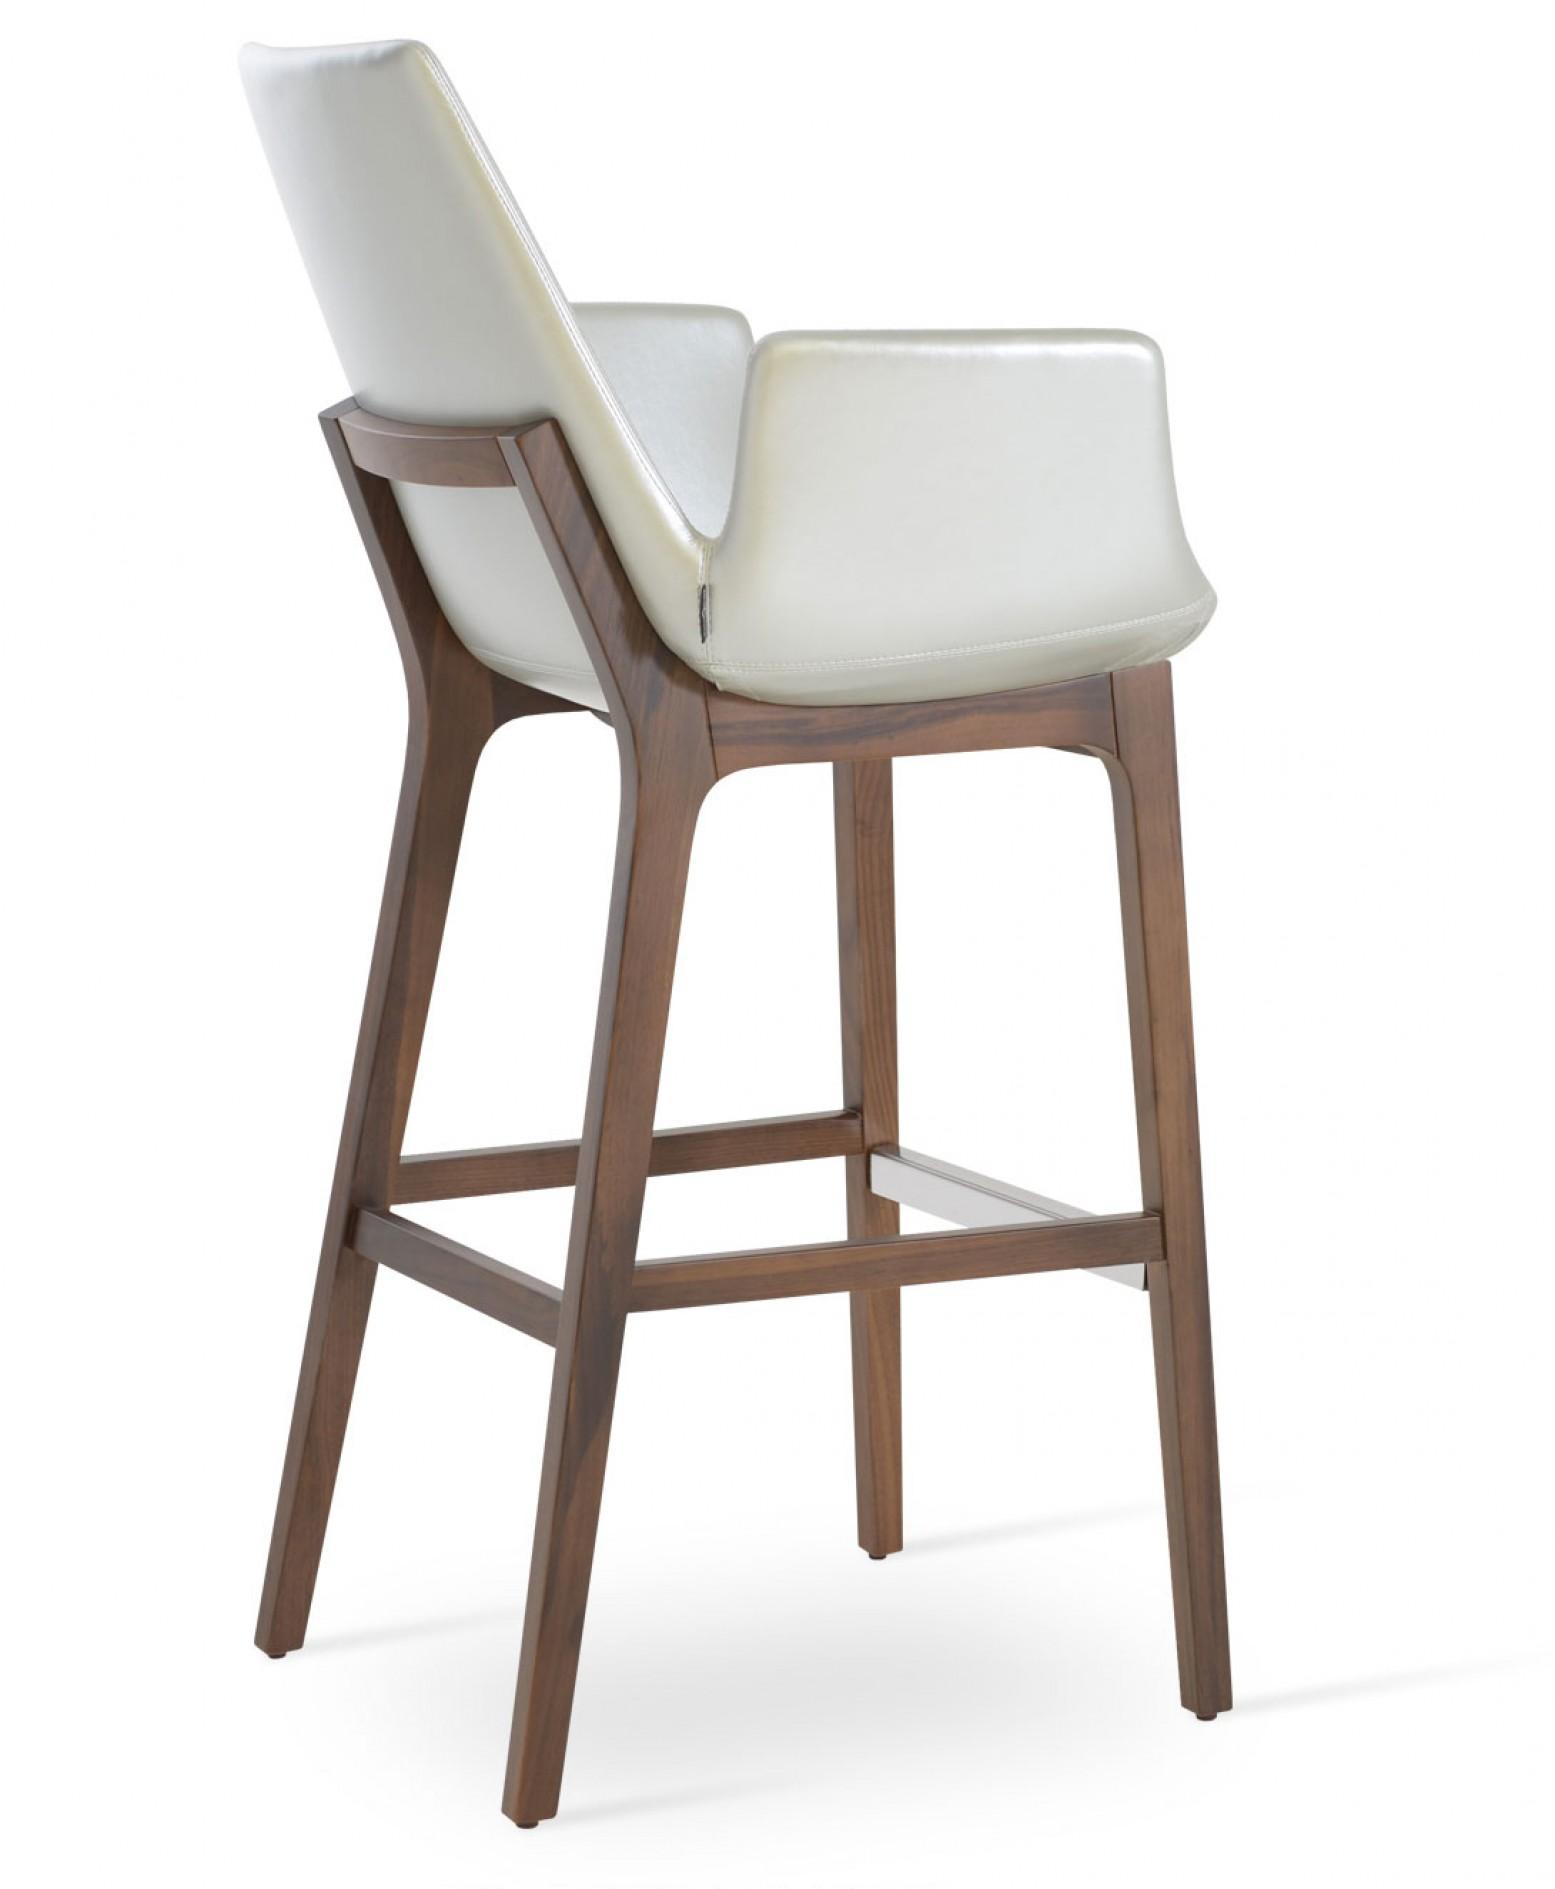 Pleasing Eiffel Arm Wood Counter Stool American Walnut Silver Ppm Inzonedesignstudio Interior Chair Design Inzonedesignstudiocom